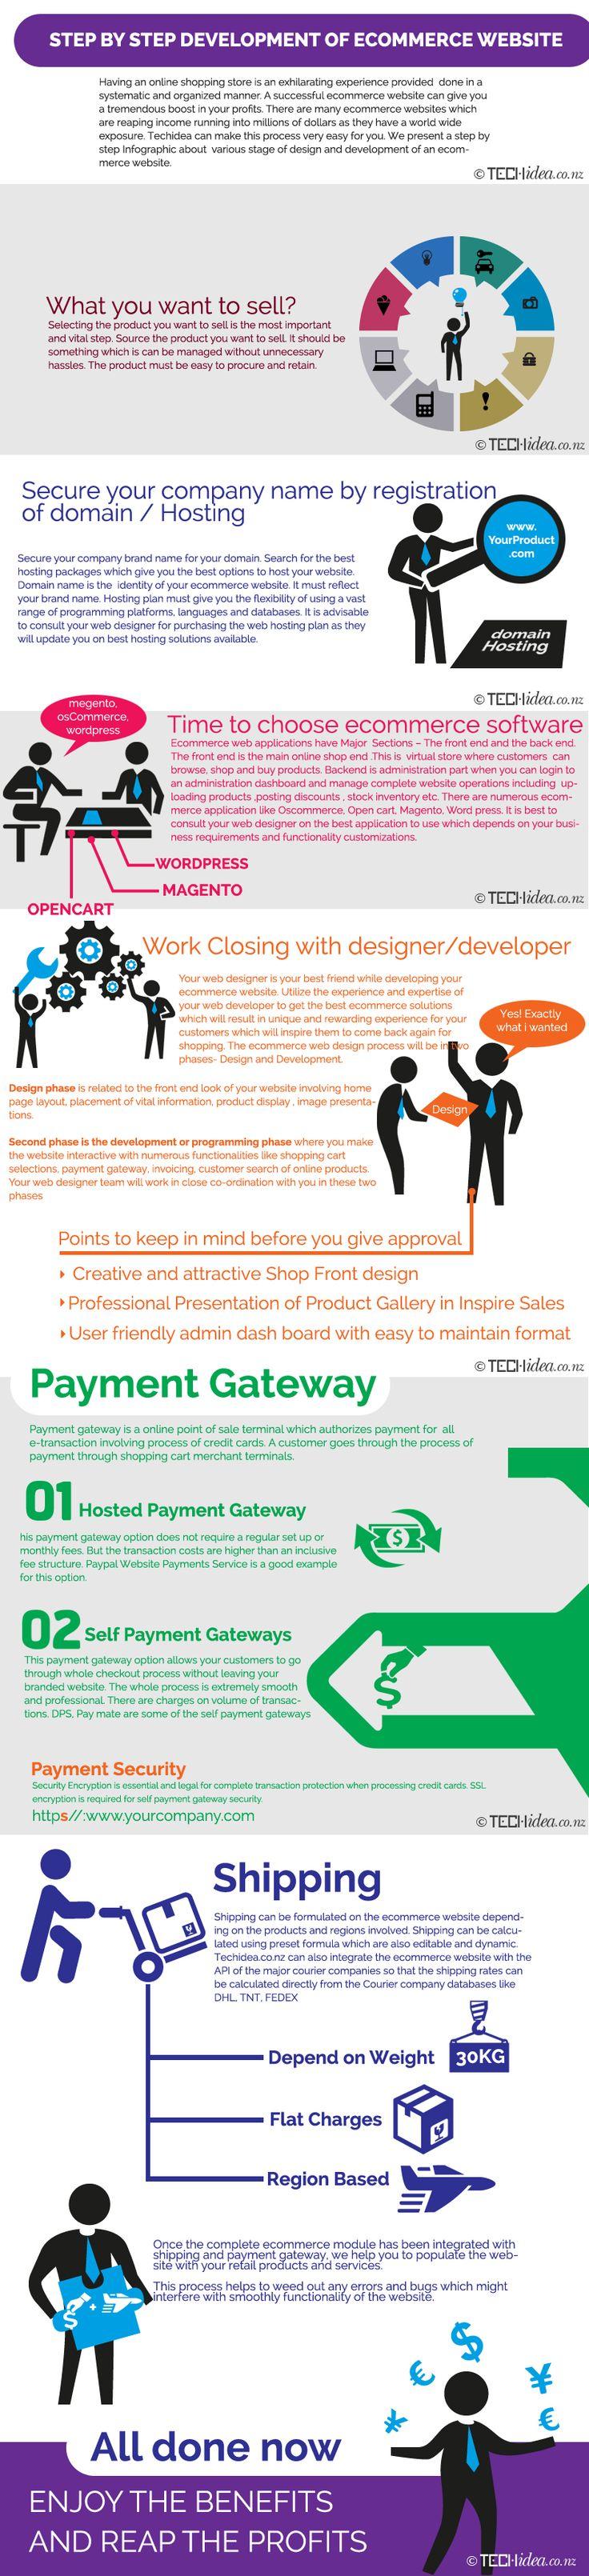 #ecommercewebsite #ecommercewebsitedesign Infographic for Making eCommerce website by Techidea